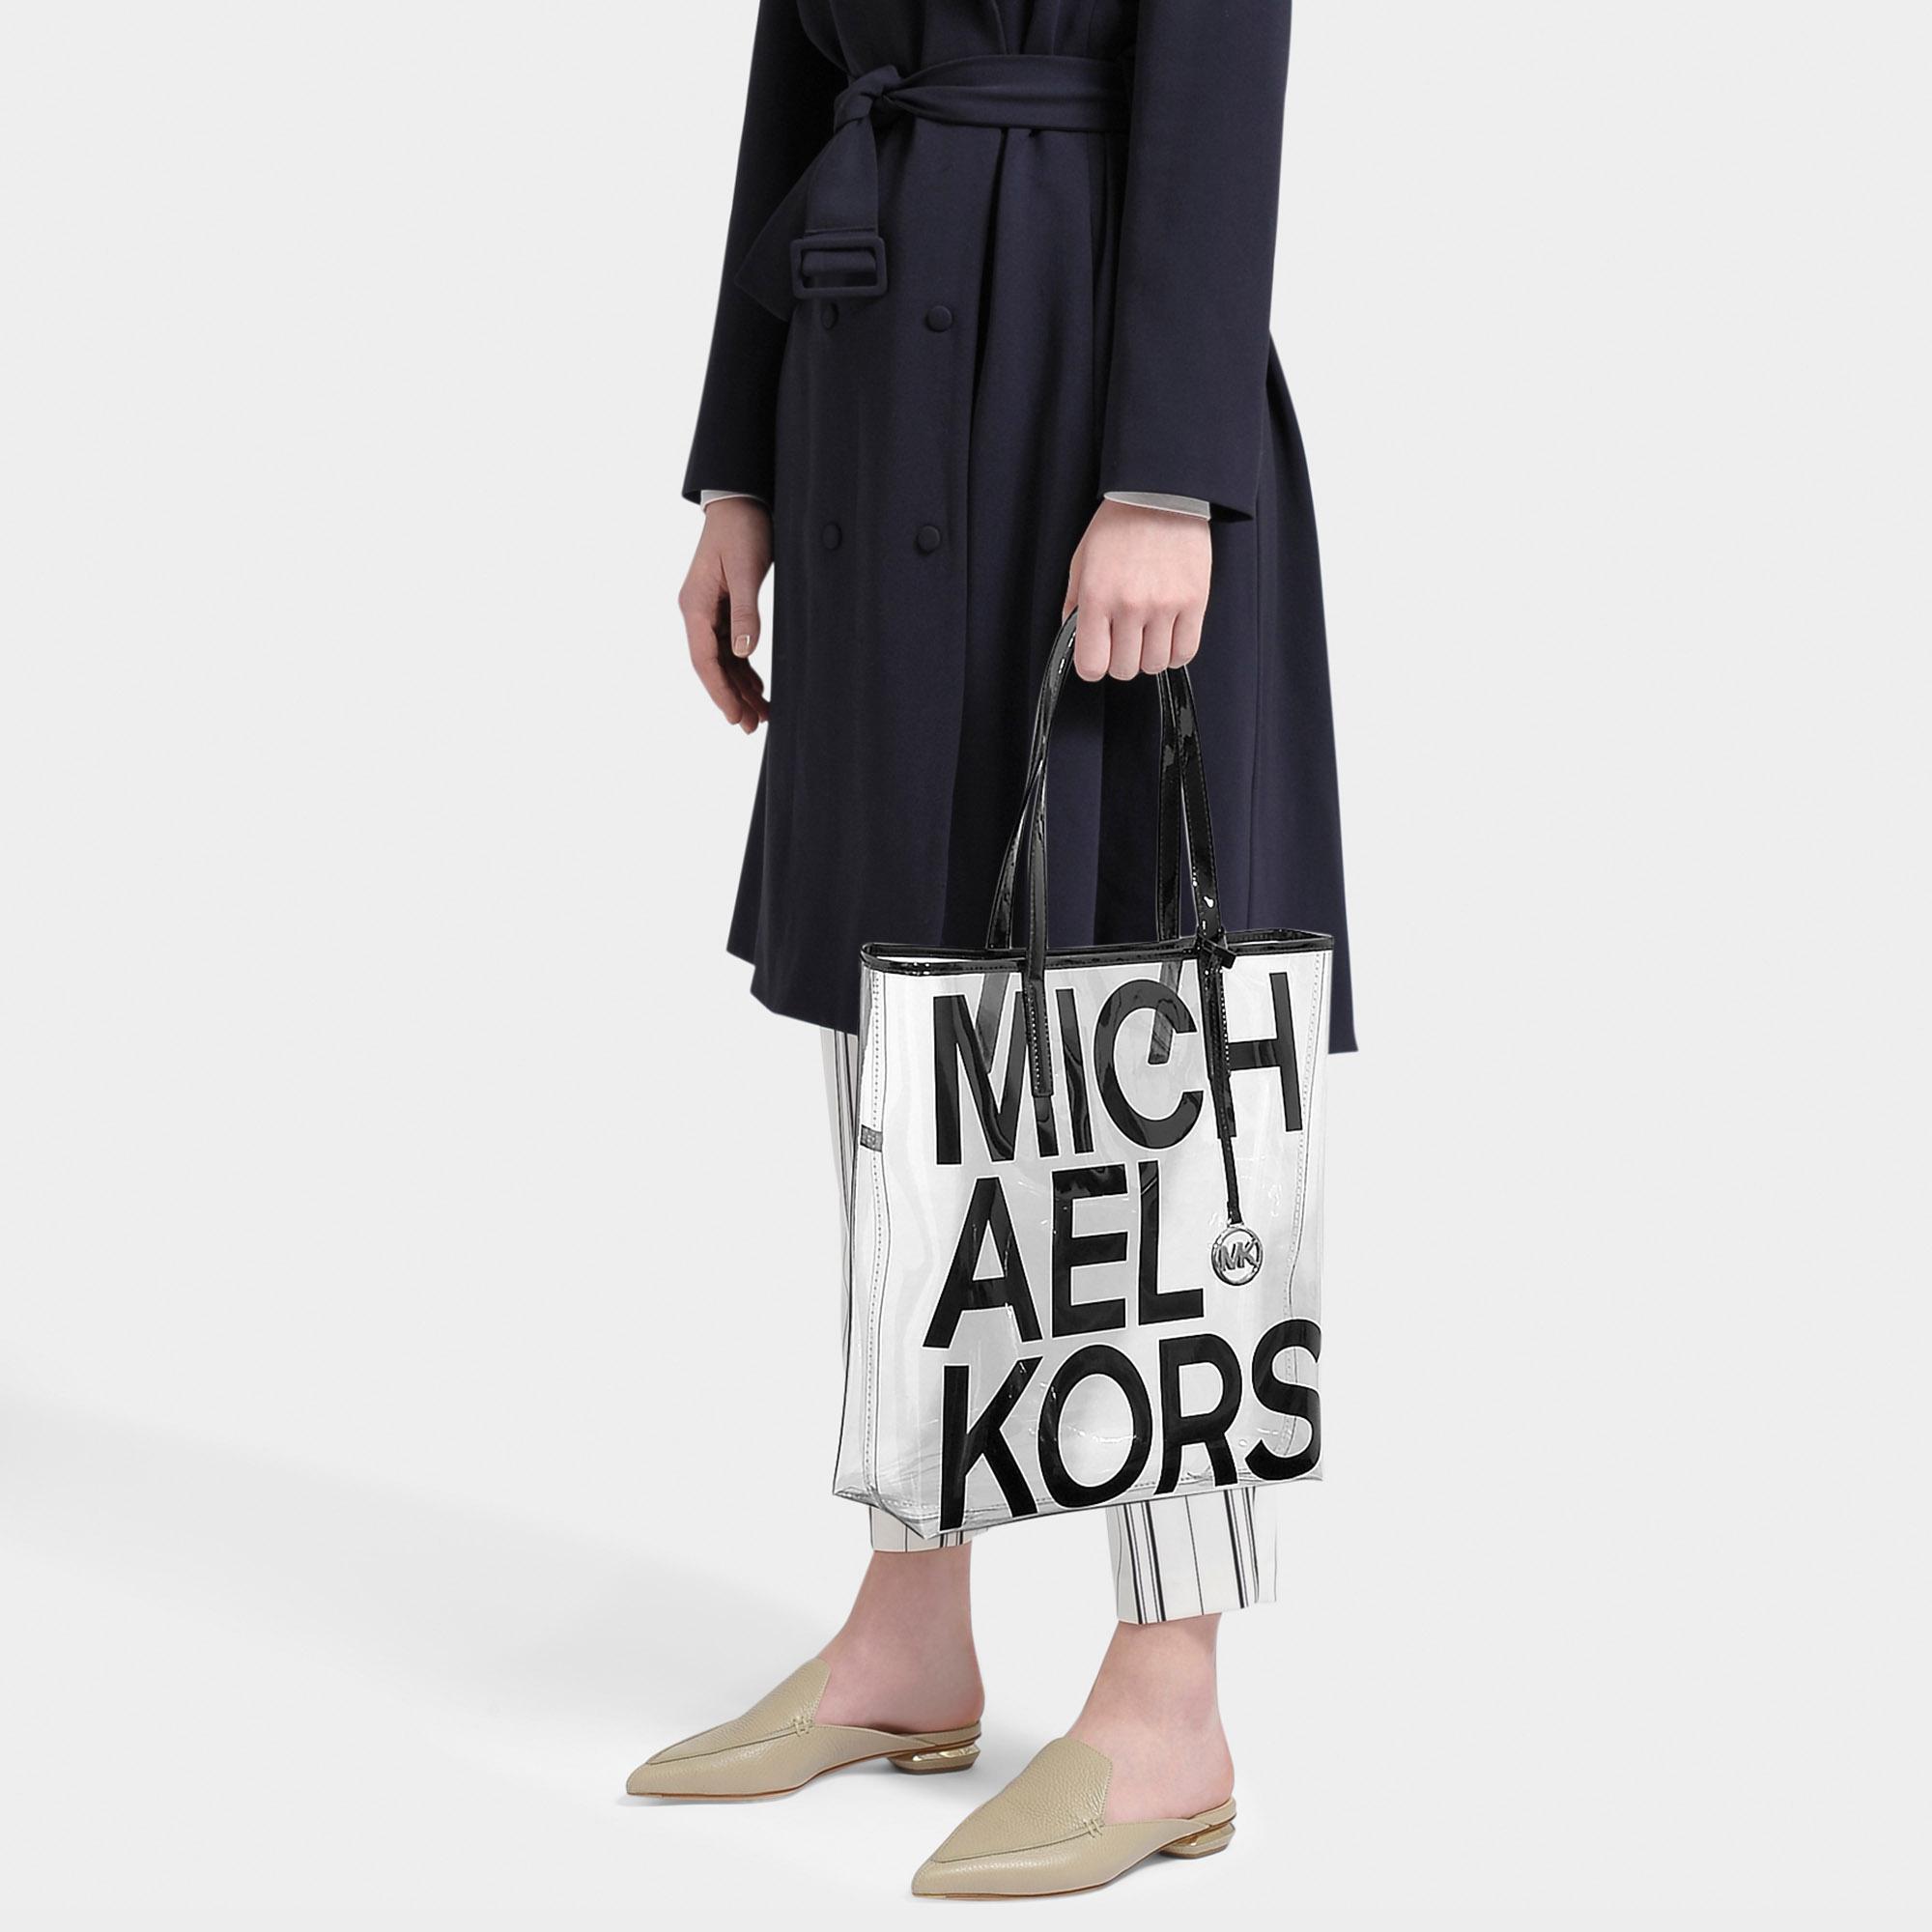 974480fdc1b583 Michael Kors - Black Michael The Michael Bag Large North South Tote - Lyst.  View fullscreen